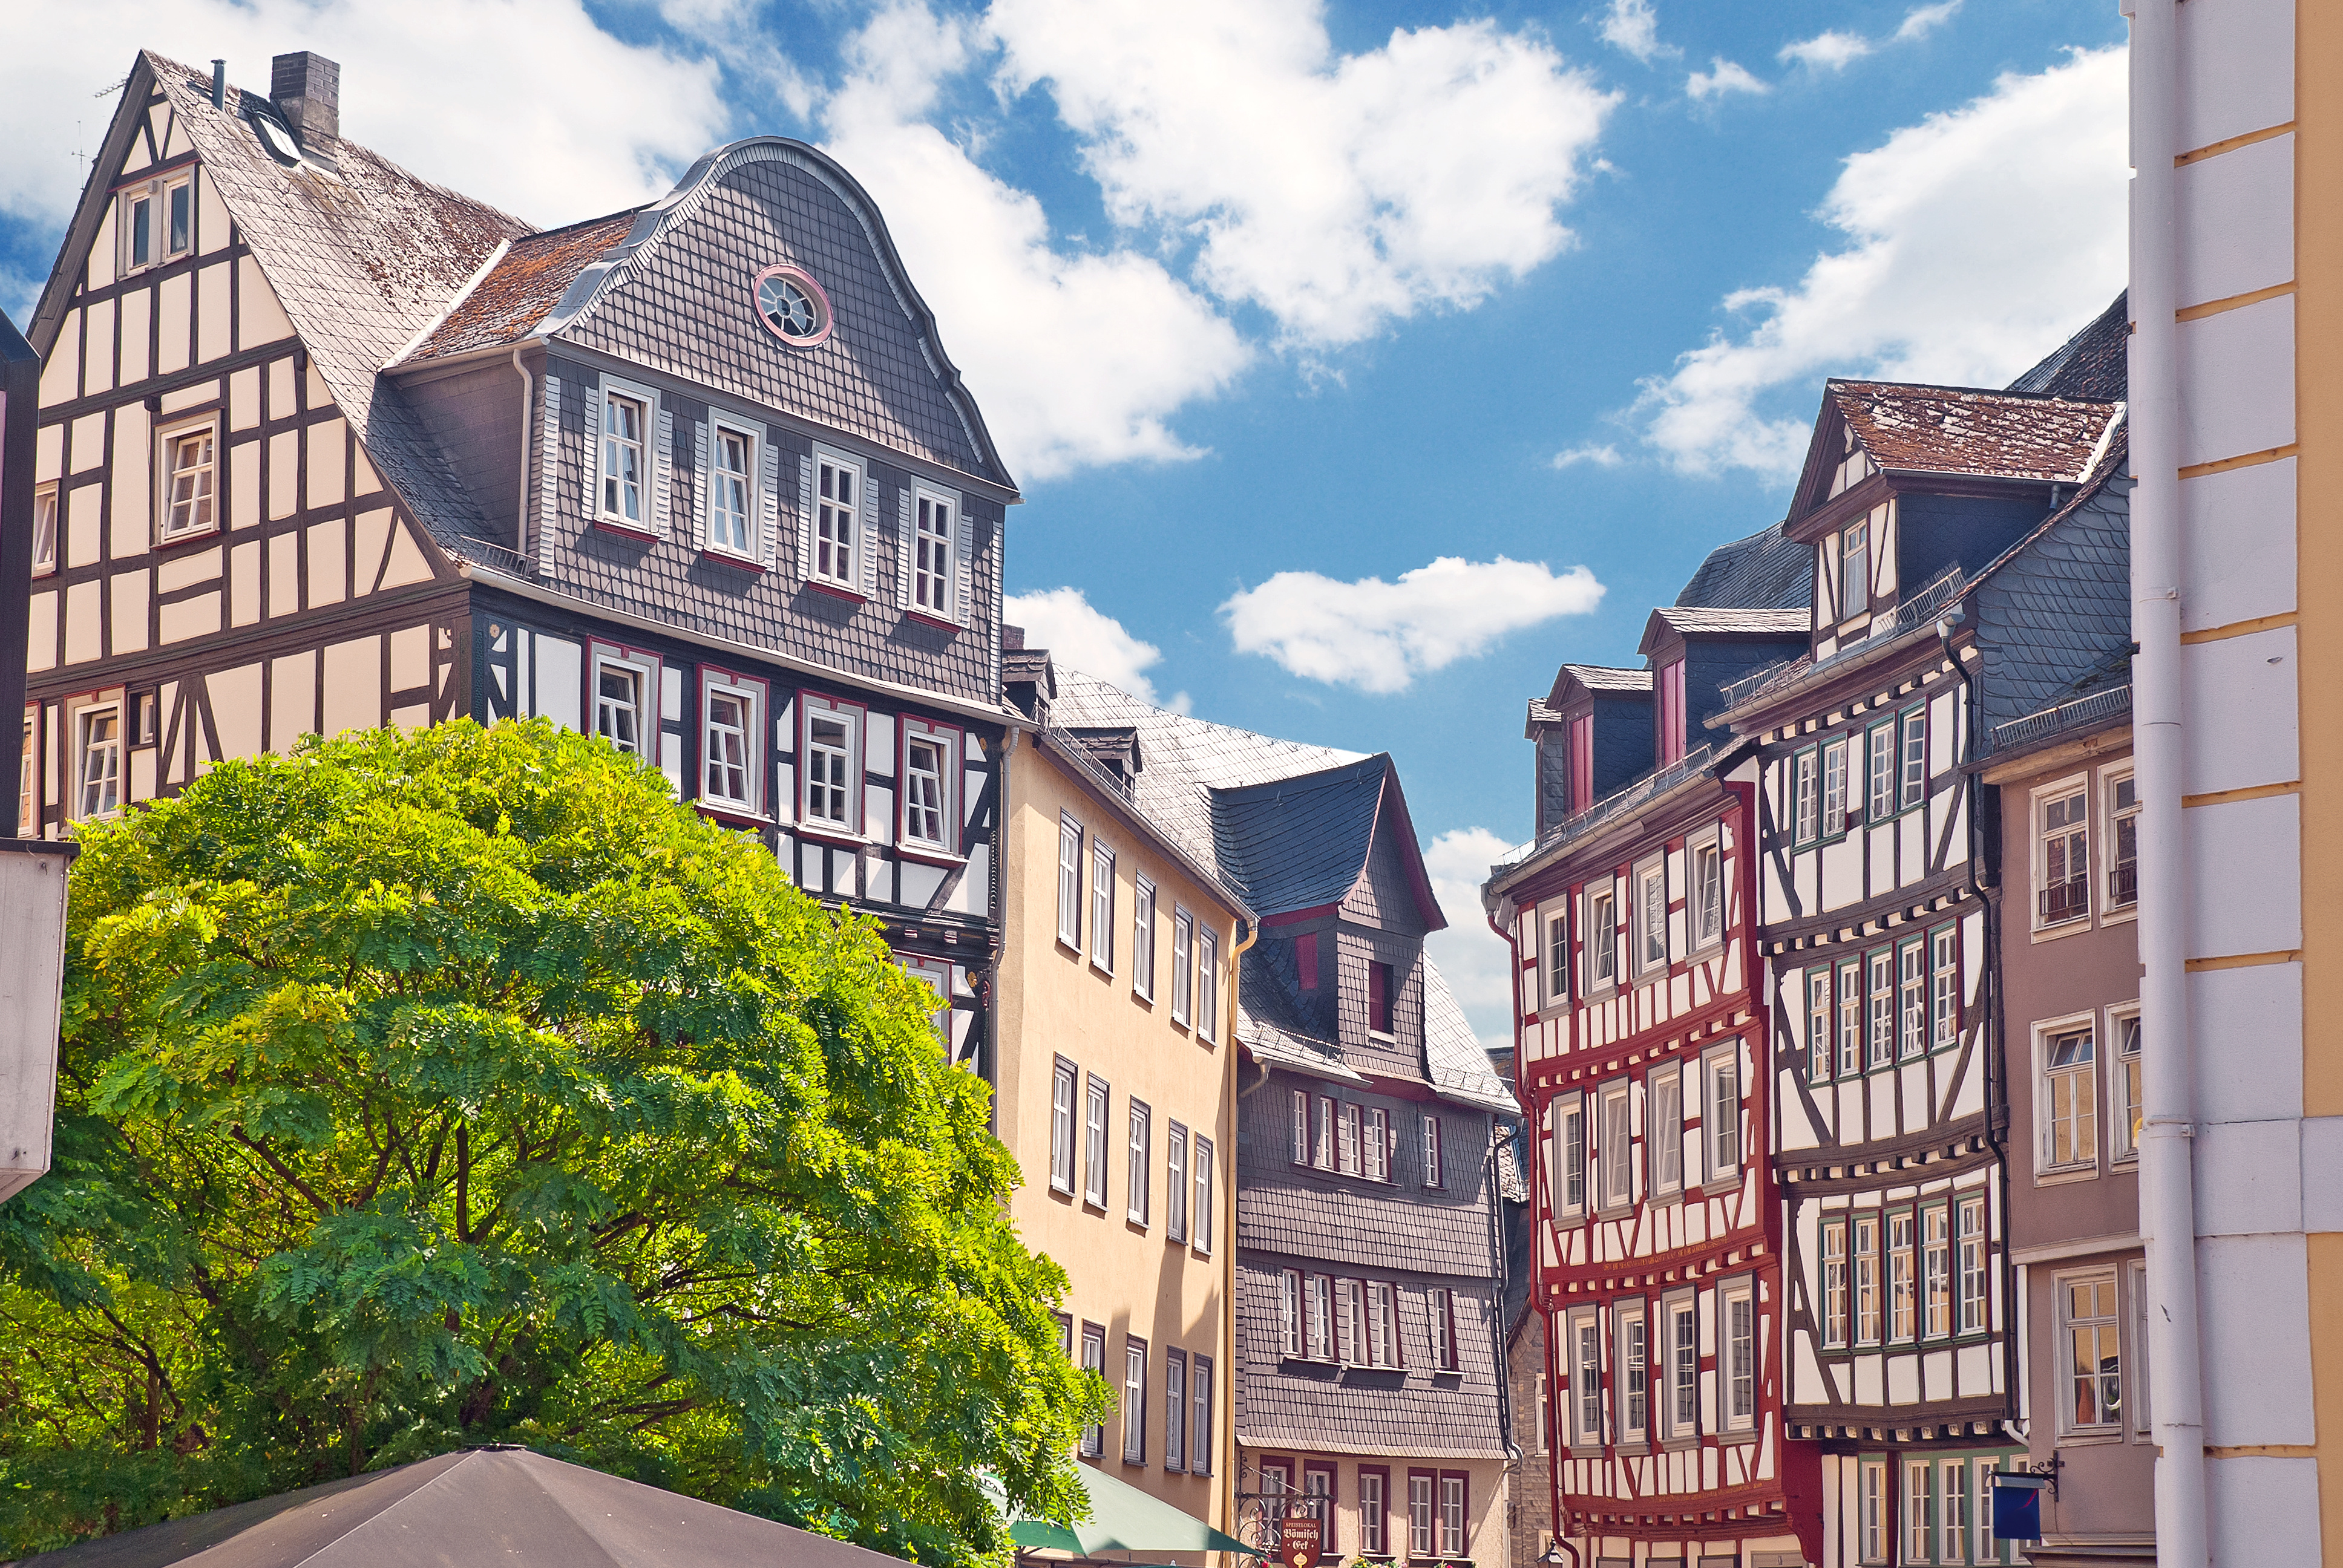 Sehenswertes In Hessen